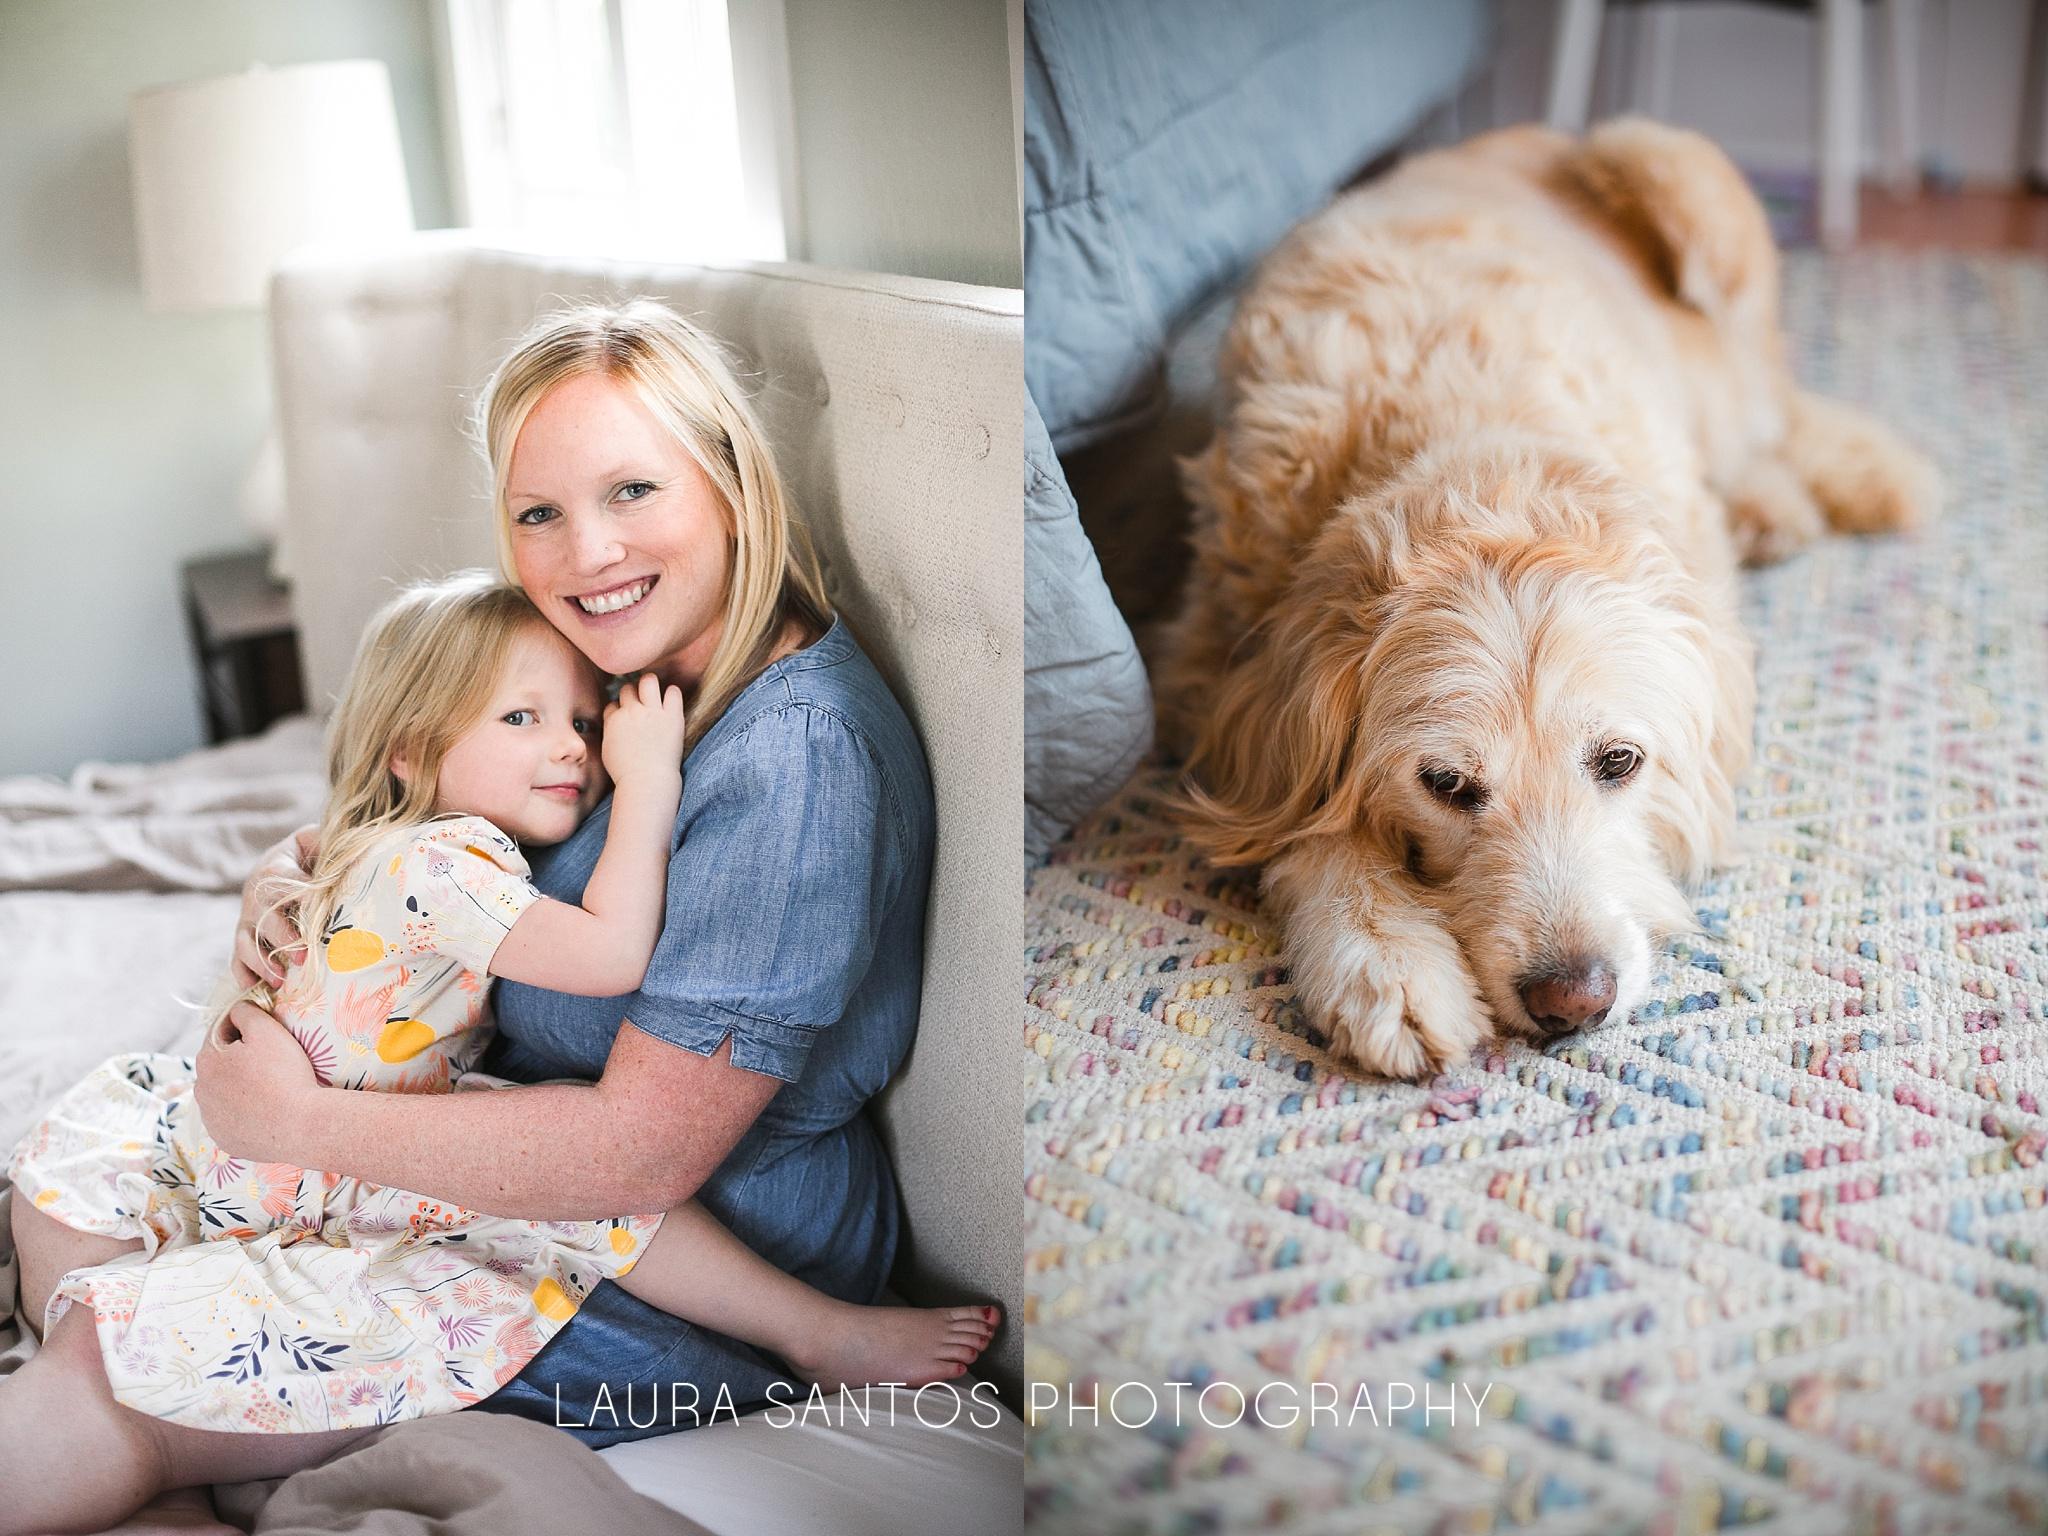 Laura Santos Photography Portland Oregon Family Photographer_0255.jpg